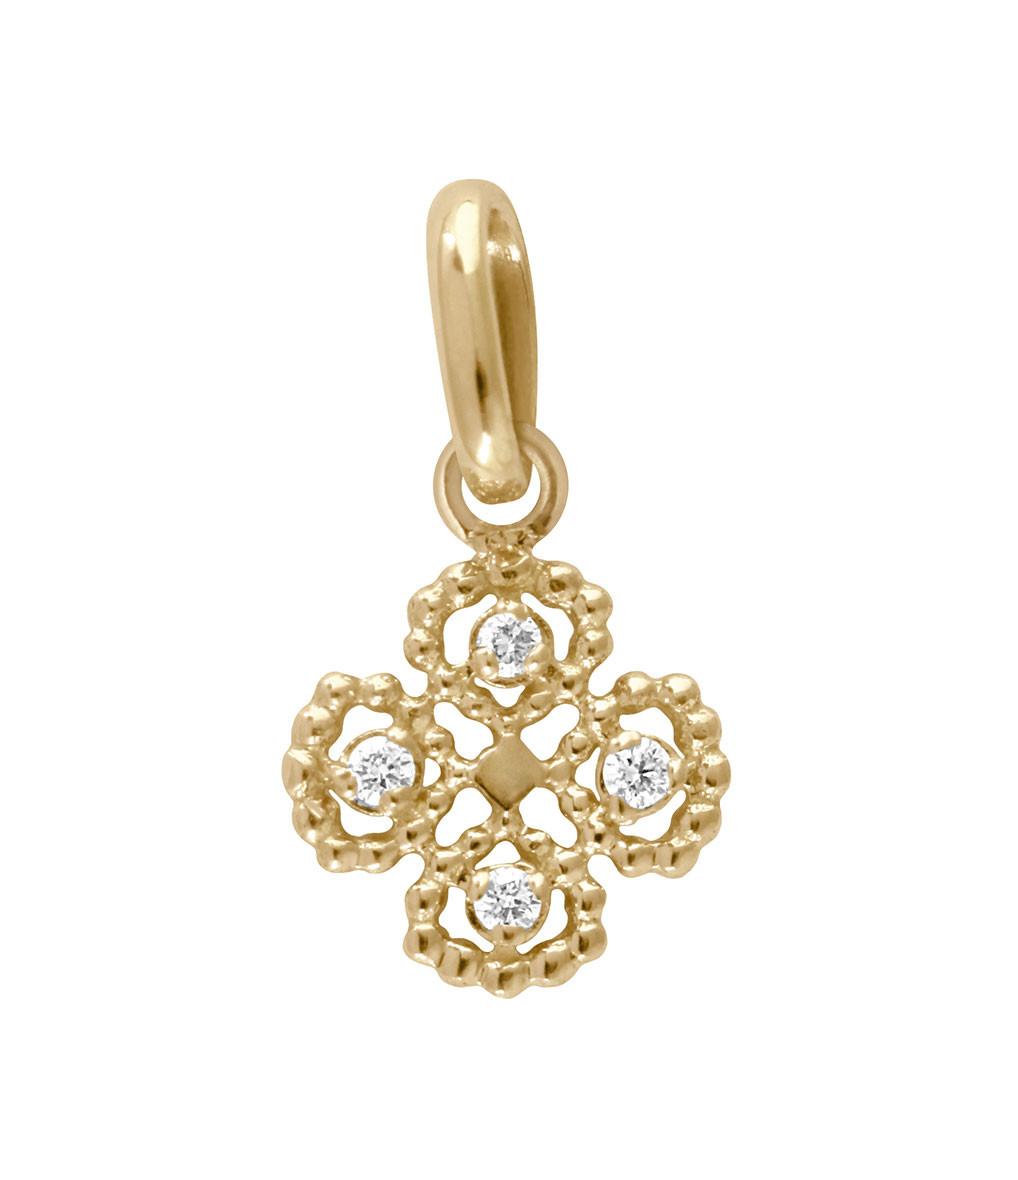 GIGI CLOZEAU - Pendentif Charm Trèfle Lucky Diamants